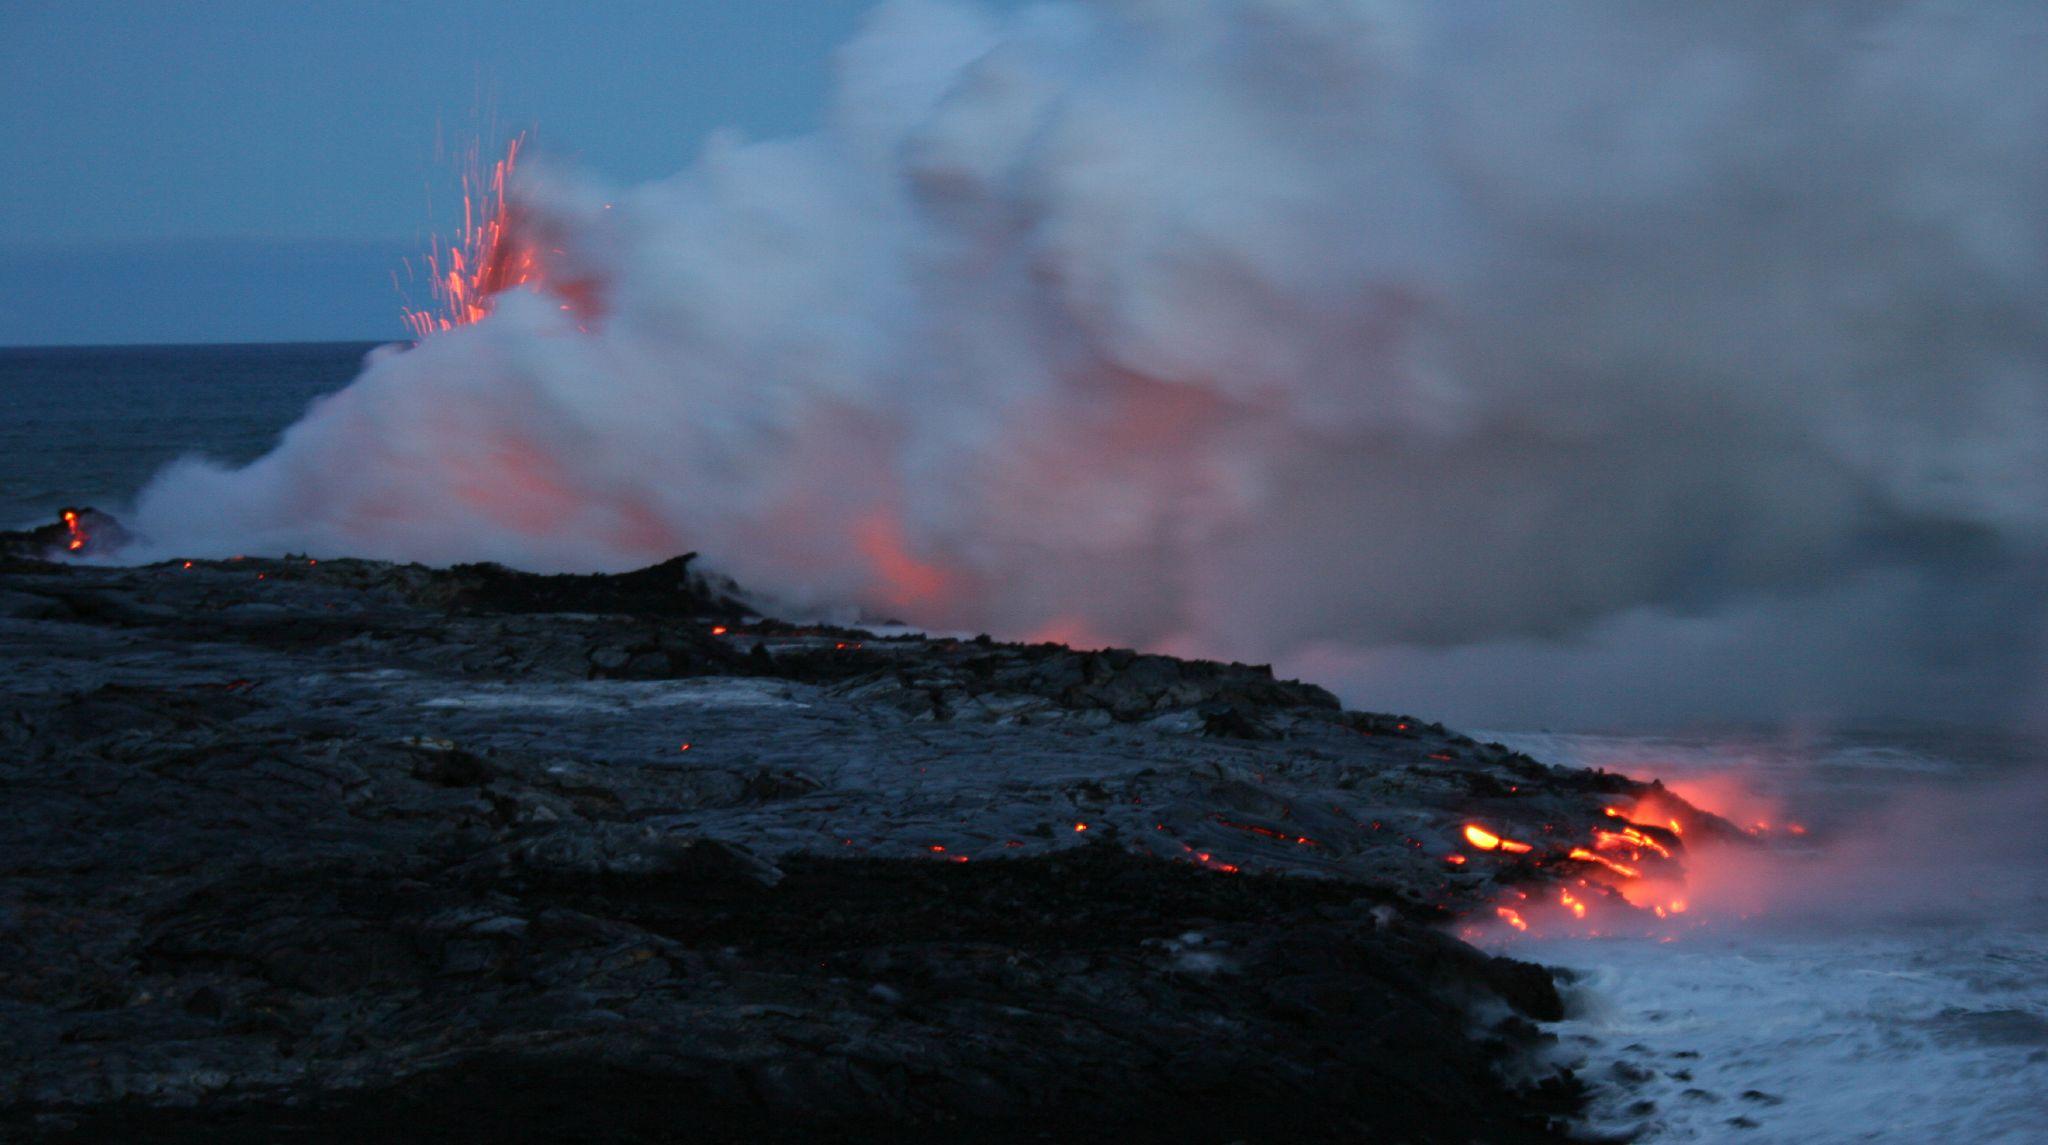 Hawaii volcano generates fast-moving lava causing new evacuations, shuts major road